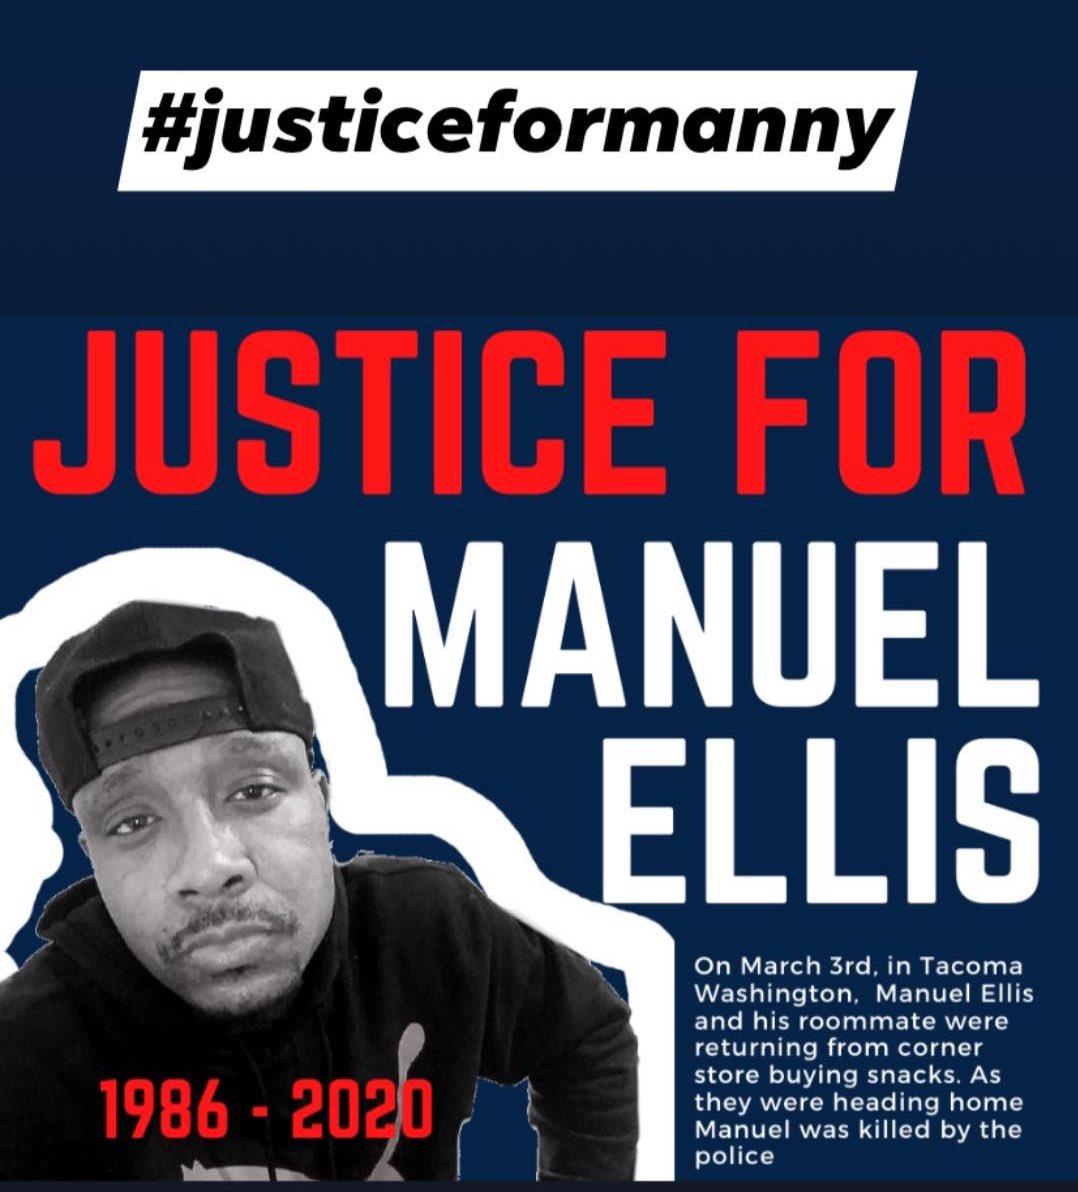 Killing of Manuel Ellis